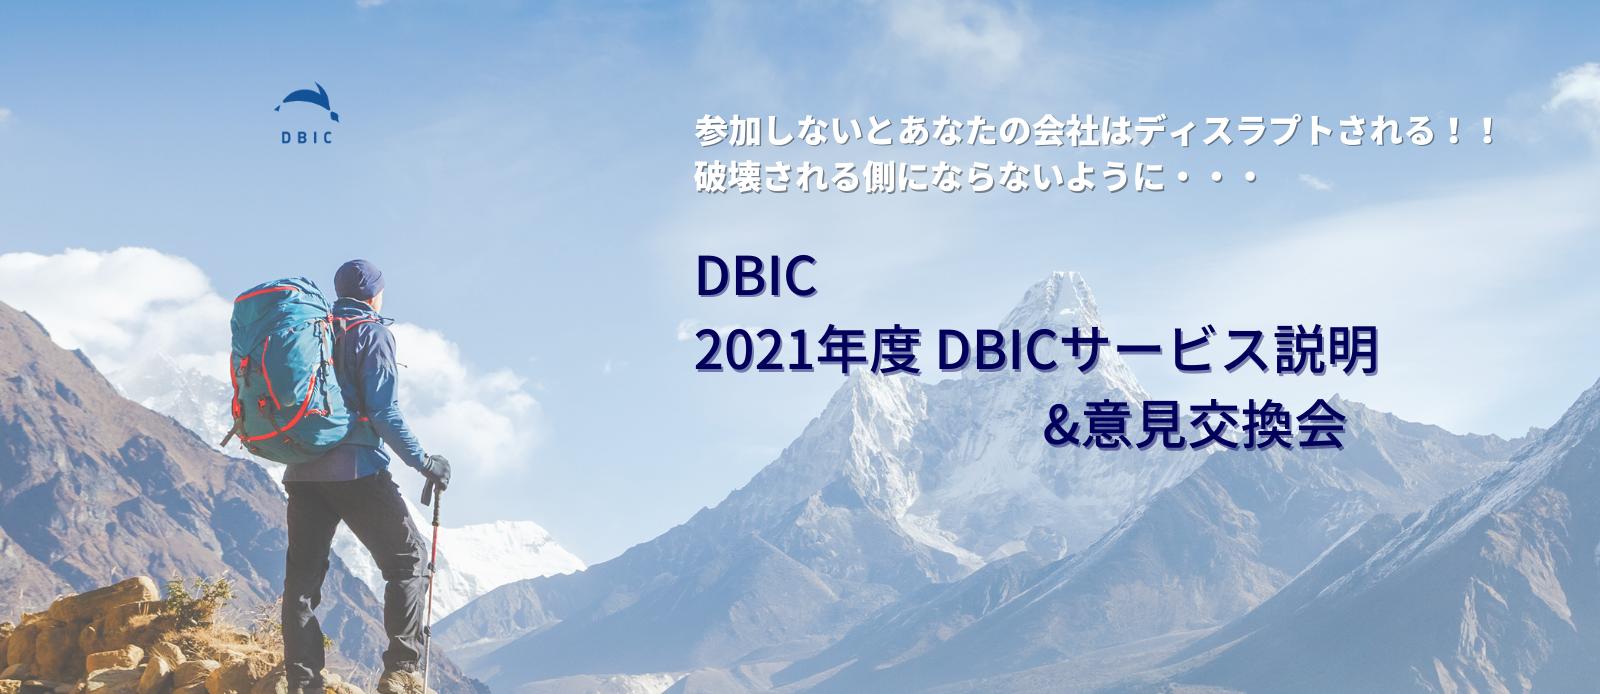 2021年度 DBICサービス説明&意見交換会